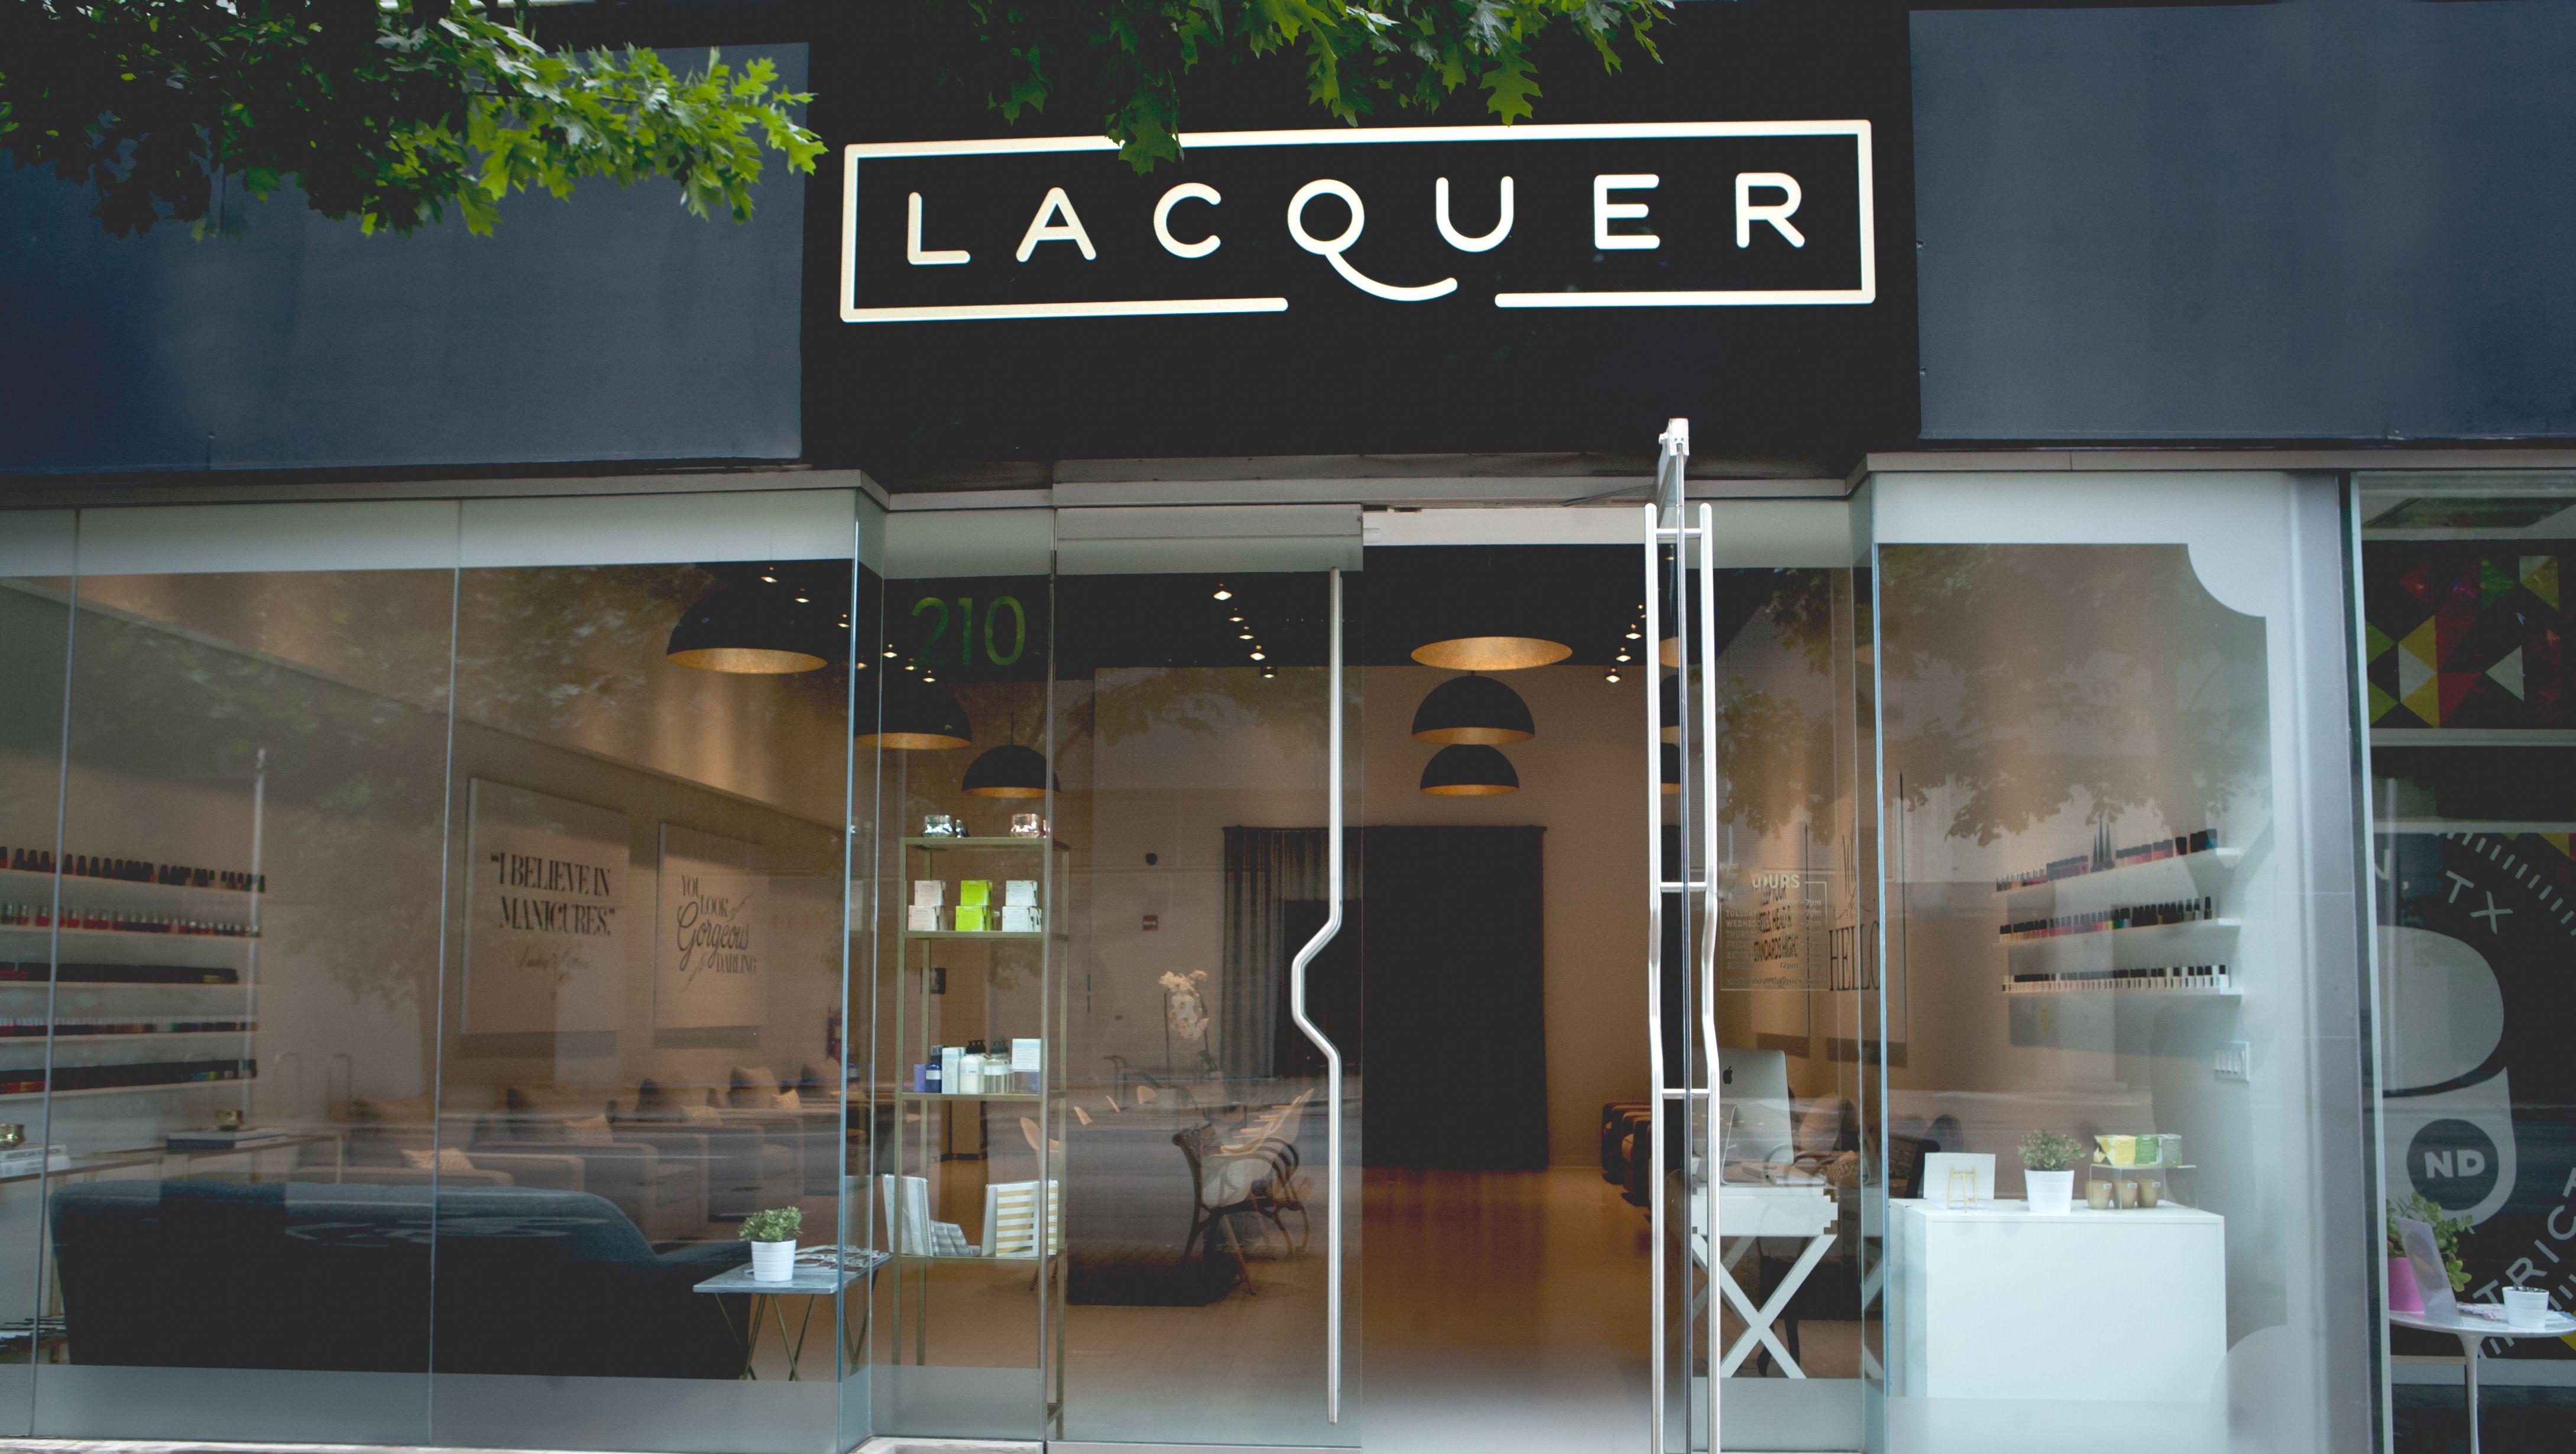 Lacquer Modern Nail Salon Downtown Austin Tx Ilovelacquer Nail